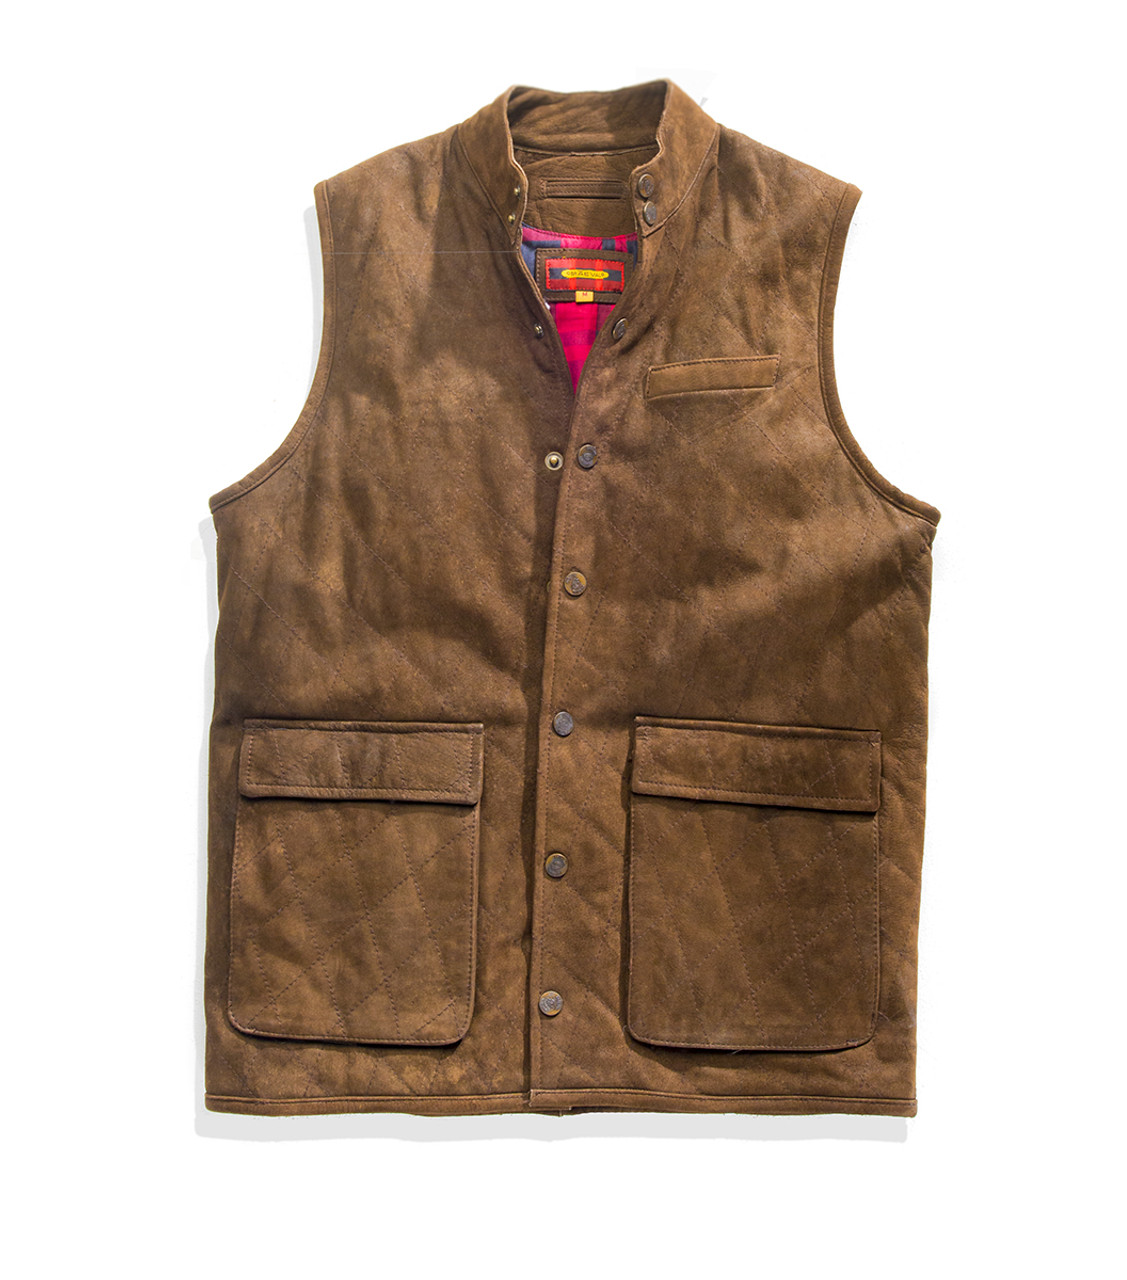 Exventurer Quilted Buffalo Nubuck Vest - Chocolate - 30% OFF